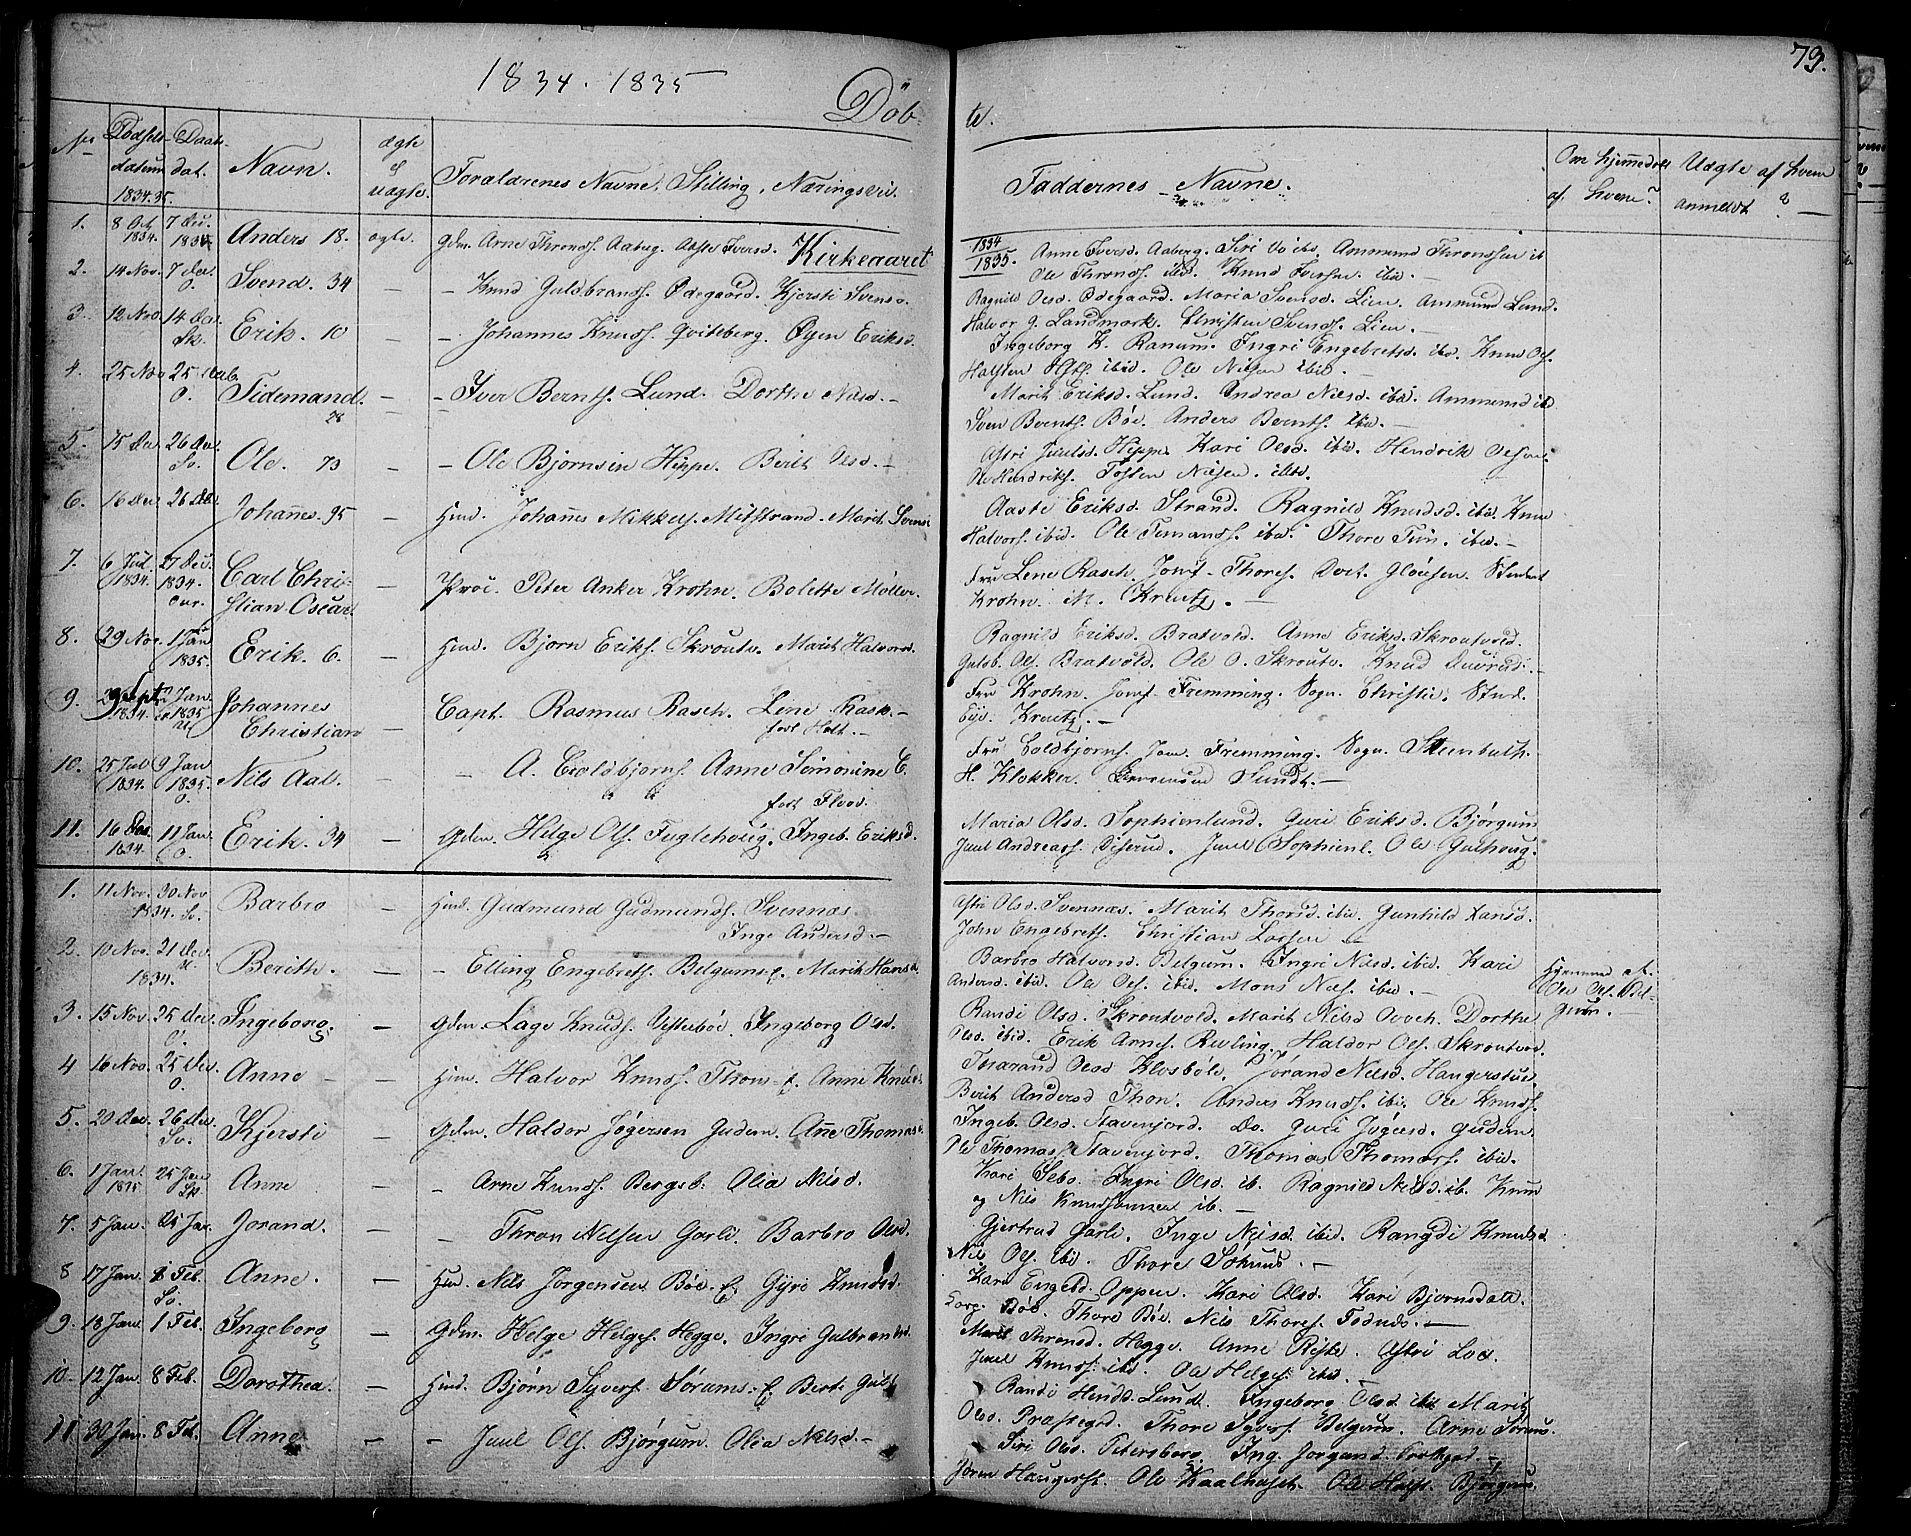 SAH, Nord-Aurdal prestekontor, Ministerialbok nr. 3, 1828-1841, s. 73